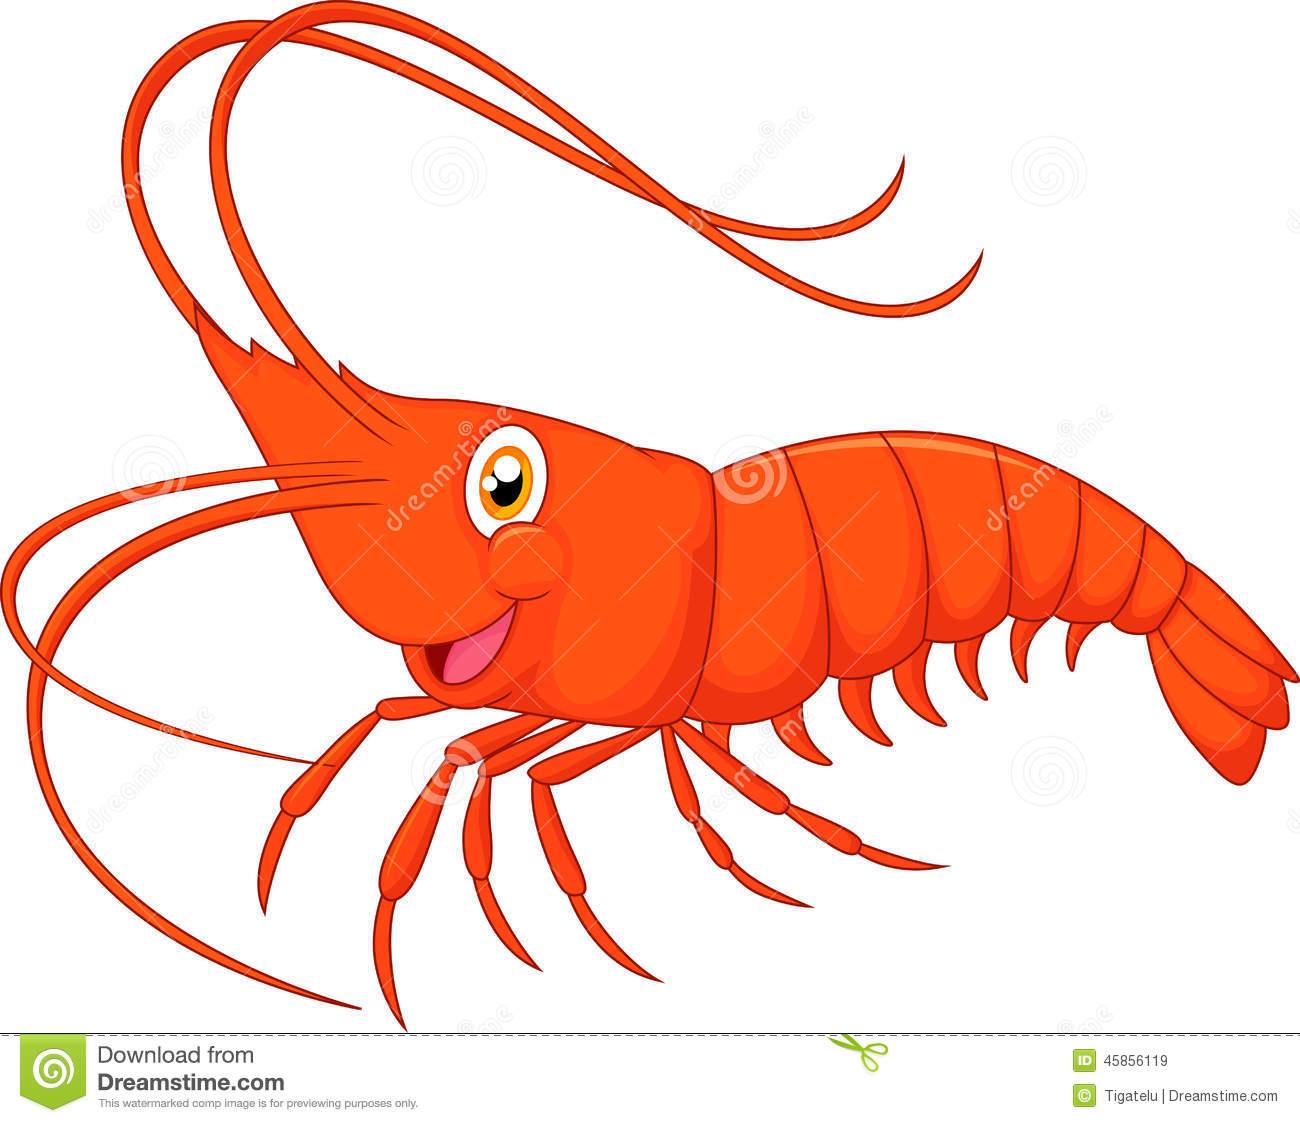 Cooked Shrimp Clipart. Cute Cartoon Shri-cooked shrimp clipart. Cute Cartoon Shrimp Stock Vector Image 45856119-5